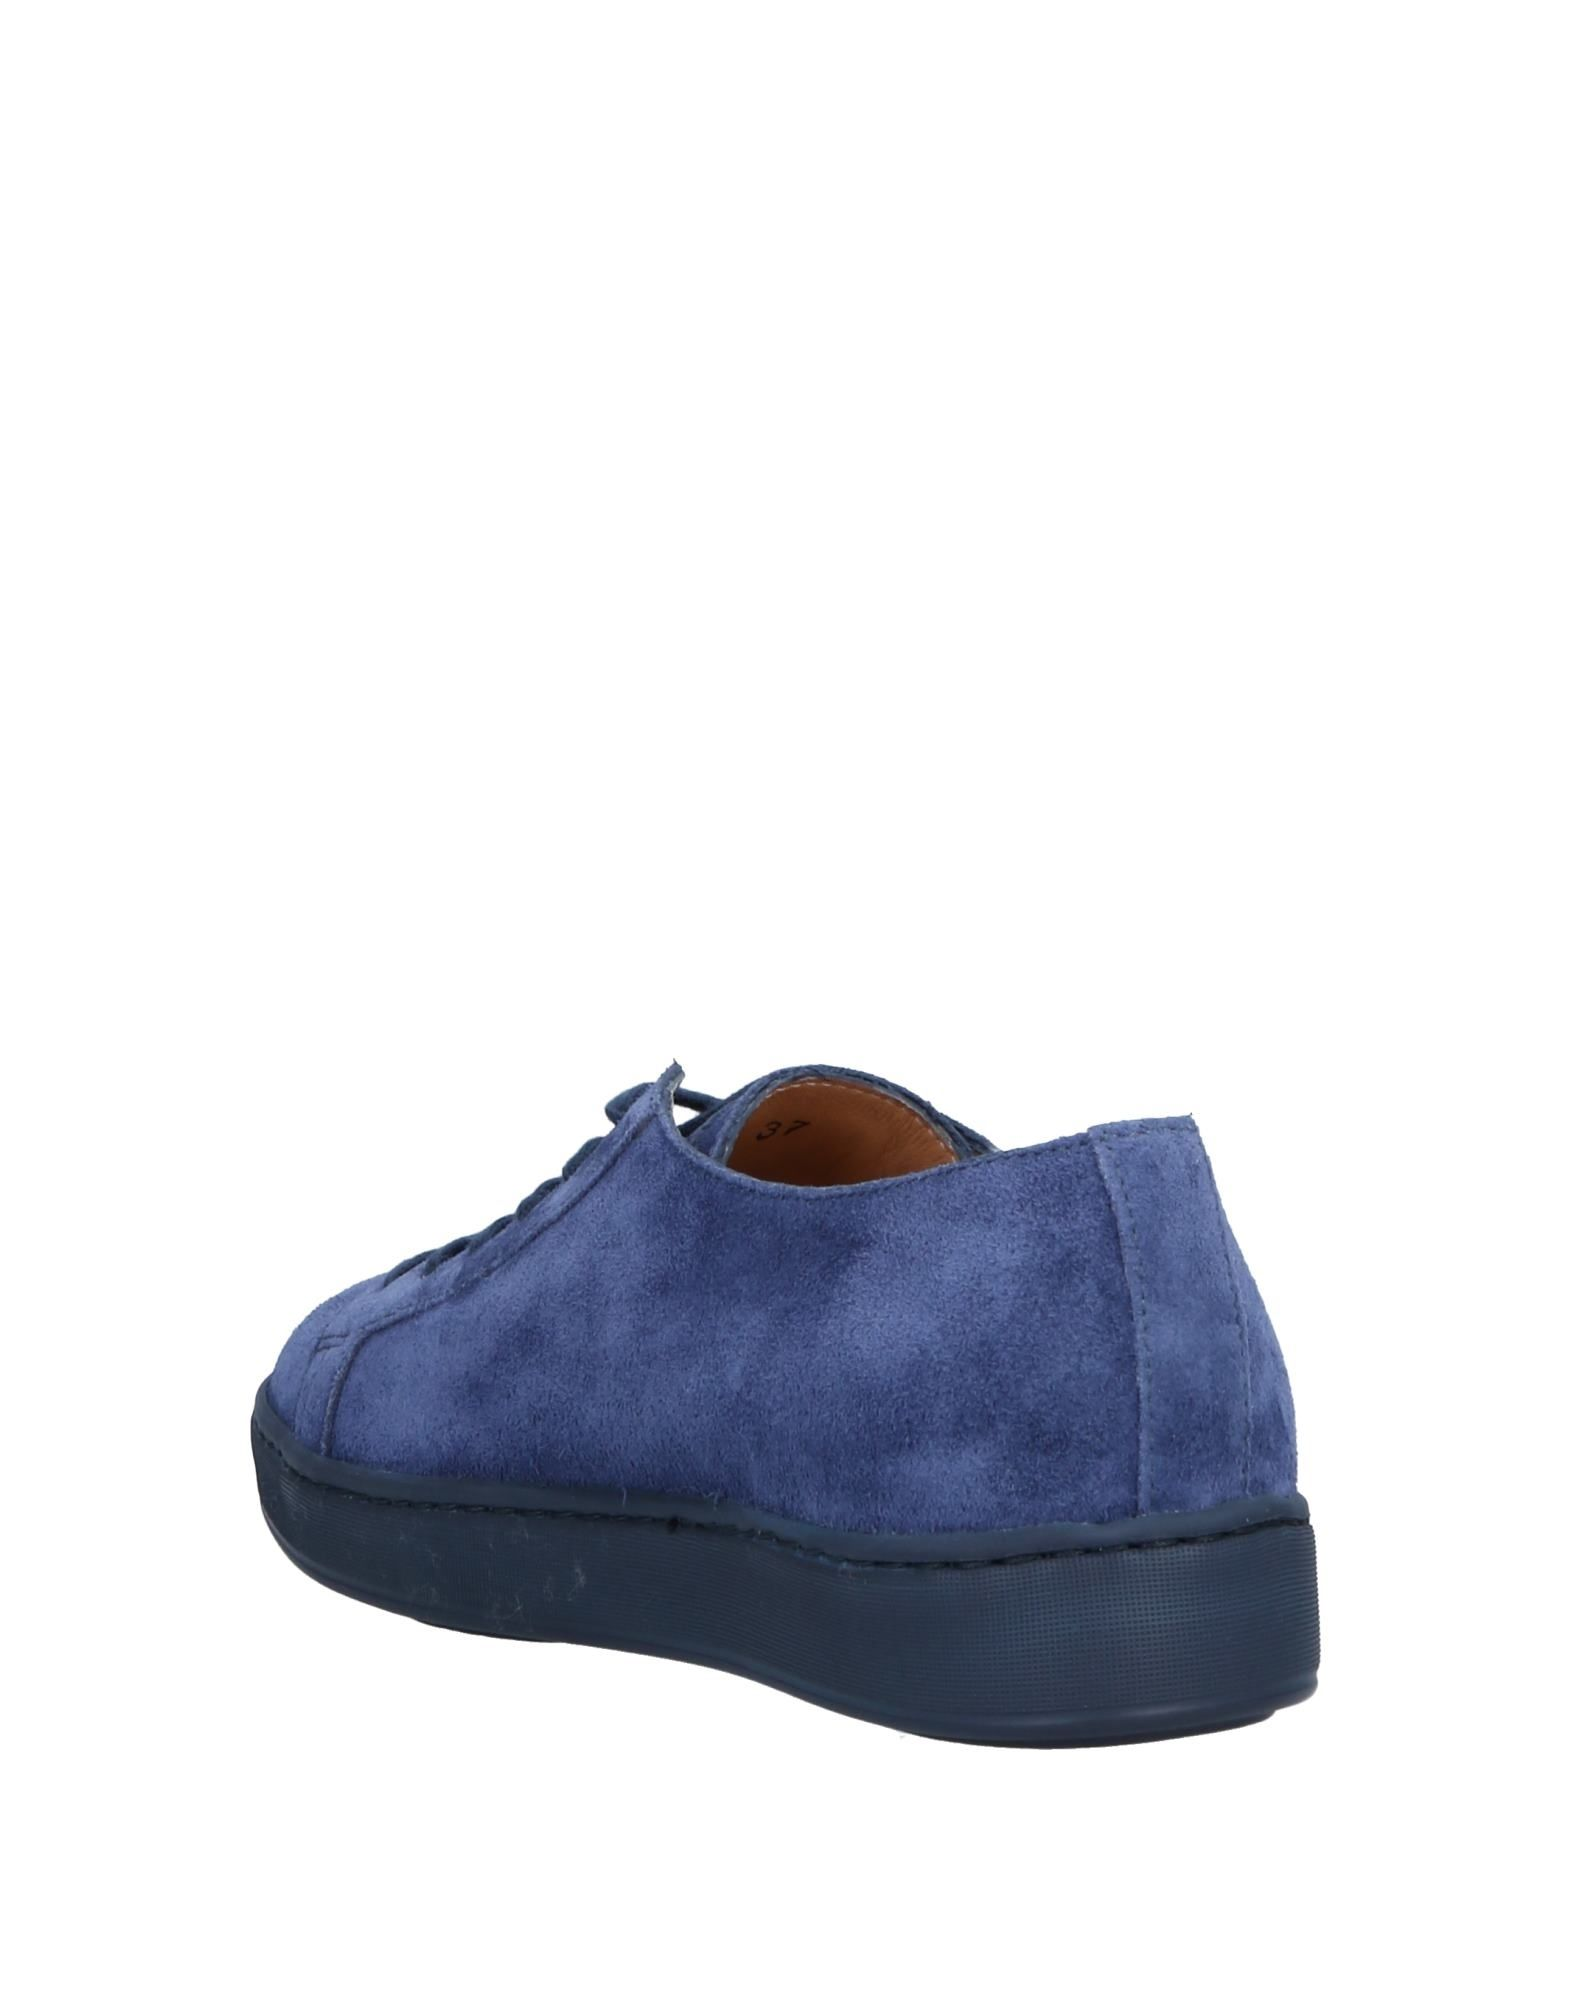 Rabatt Schuhe Damen Santoni Turnschuhes Damen Schuhe 11543072CV 3786e2